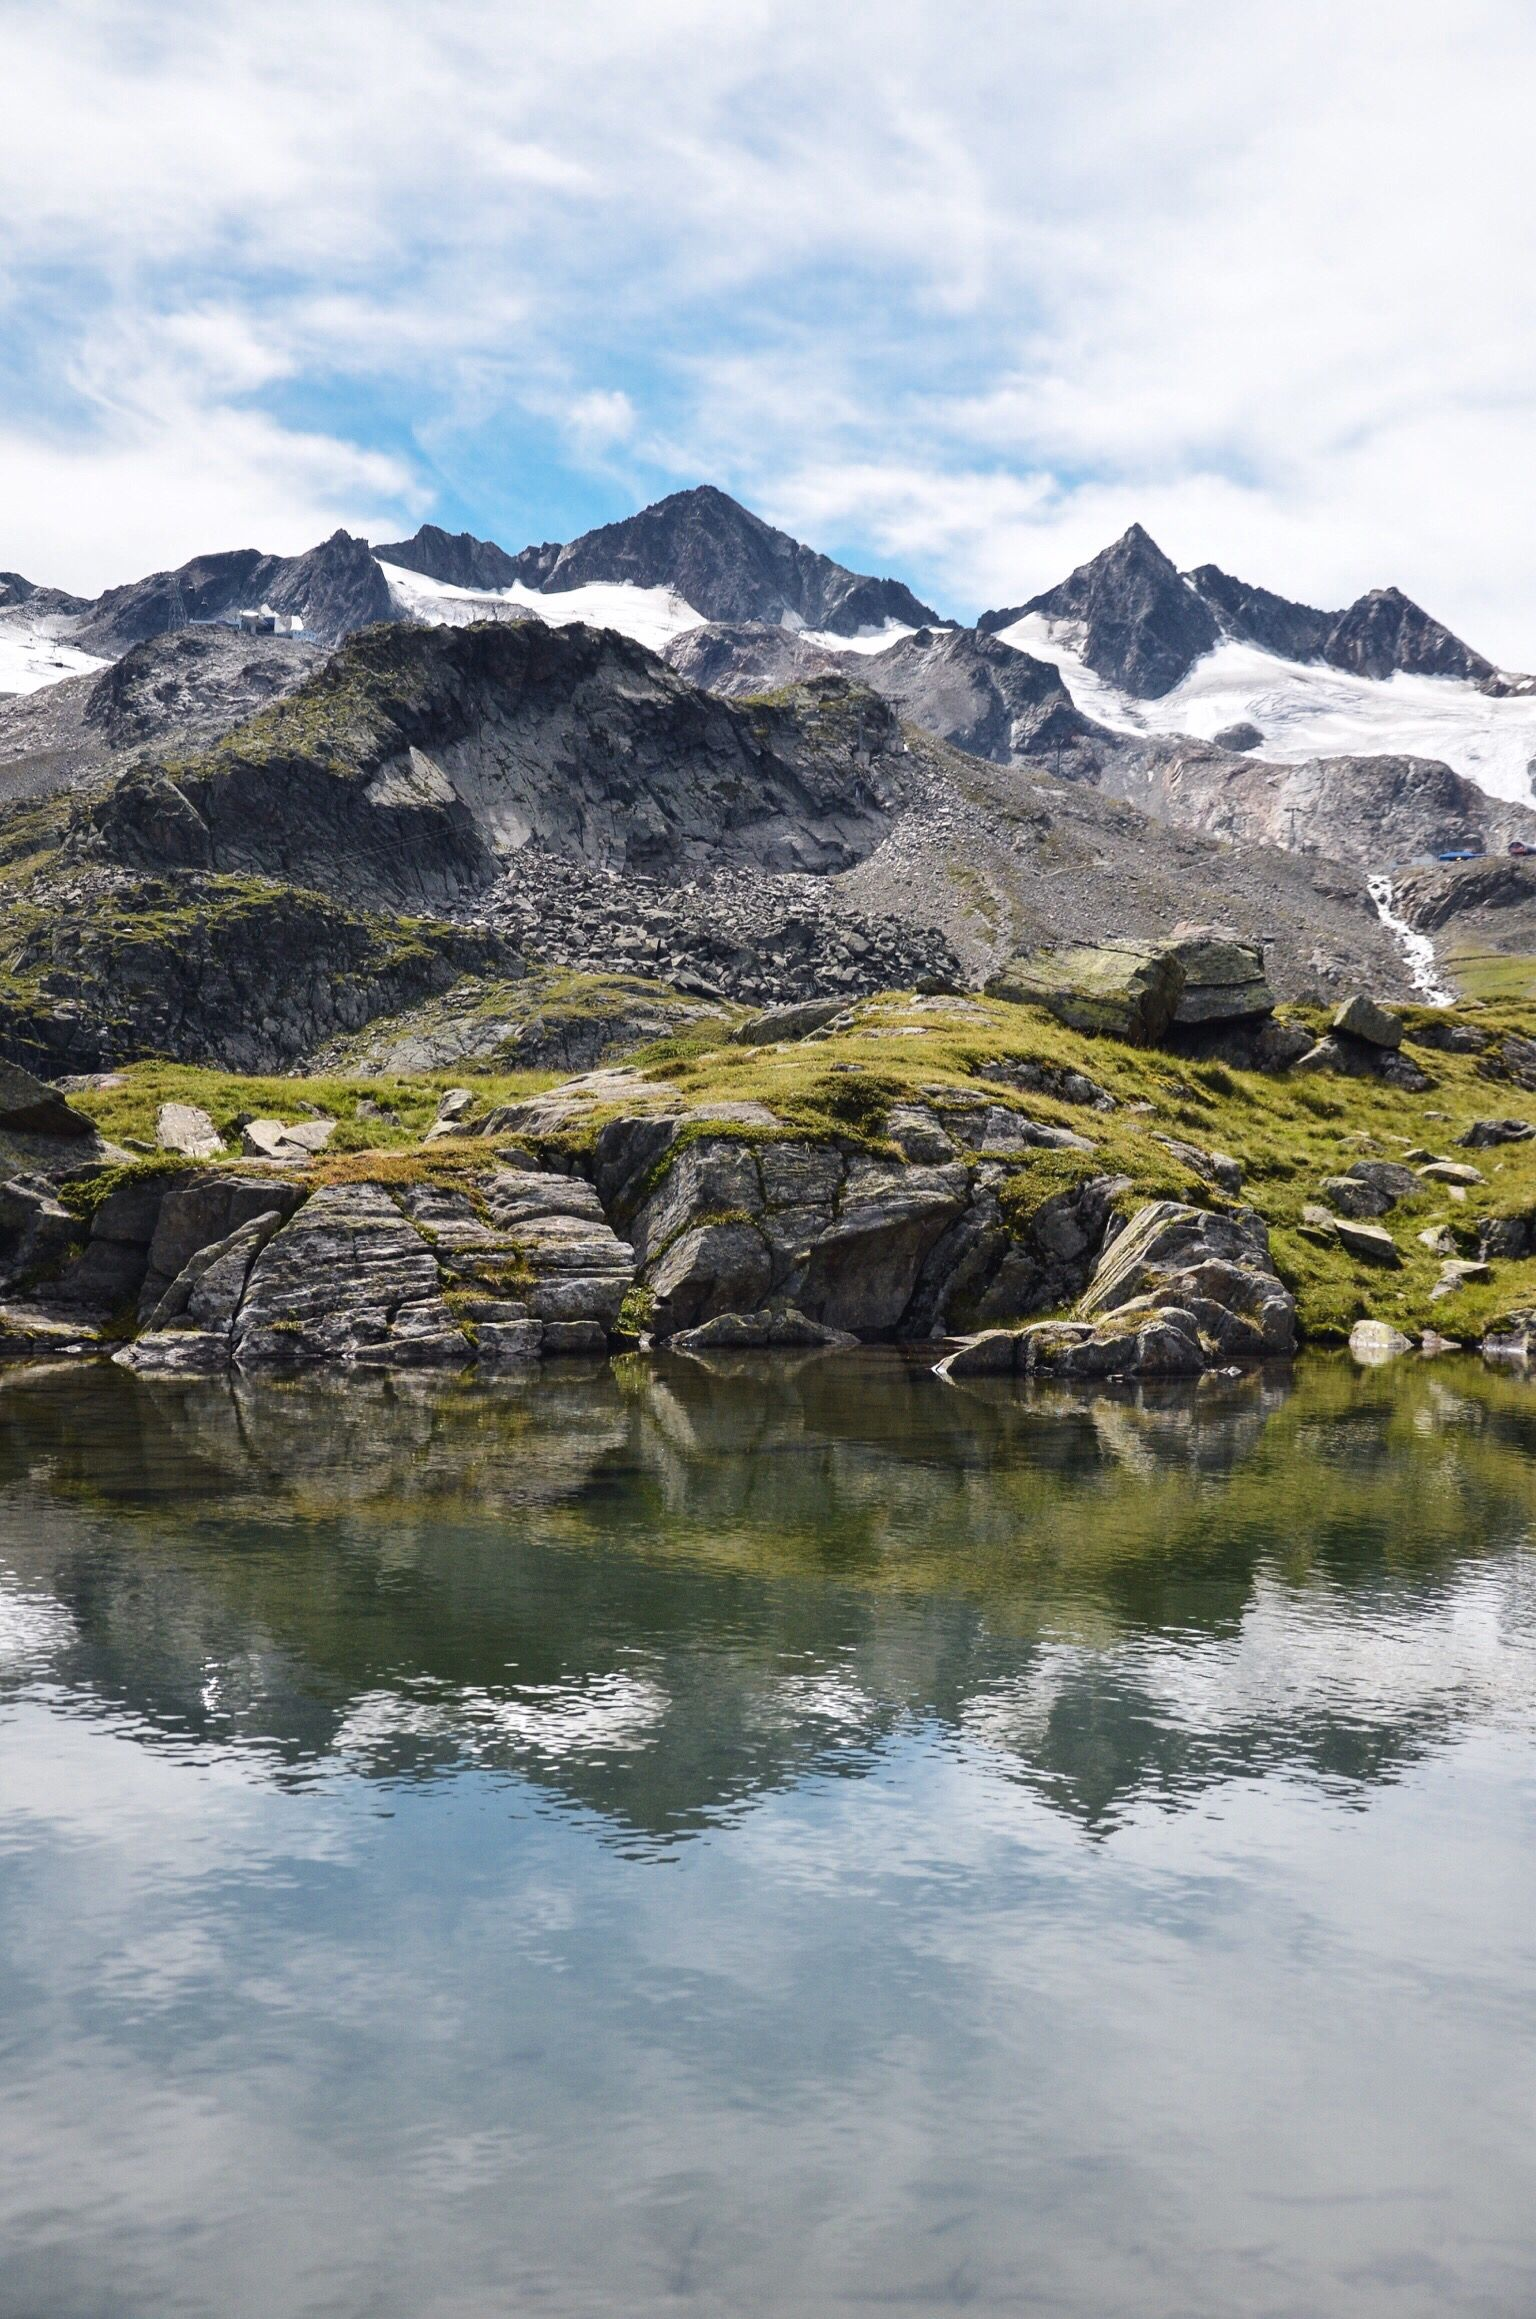 Egesensee Am Stubaier Gletscher Wanderung Ab Dresdner Hutte Zum